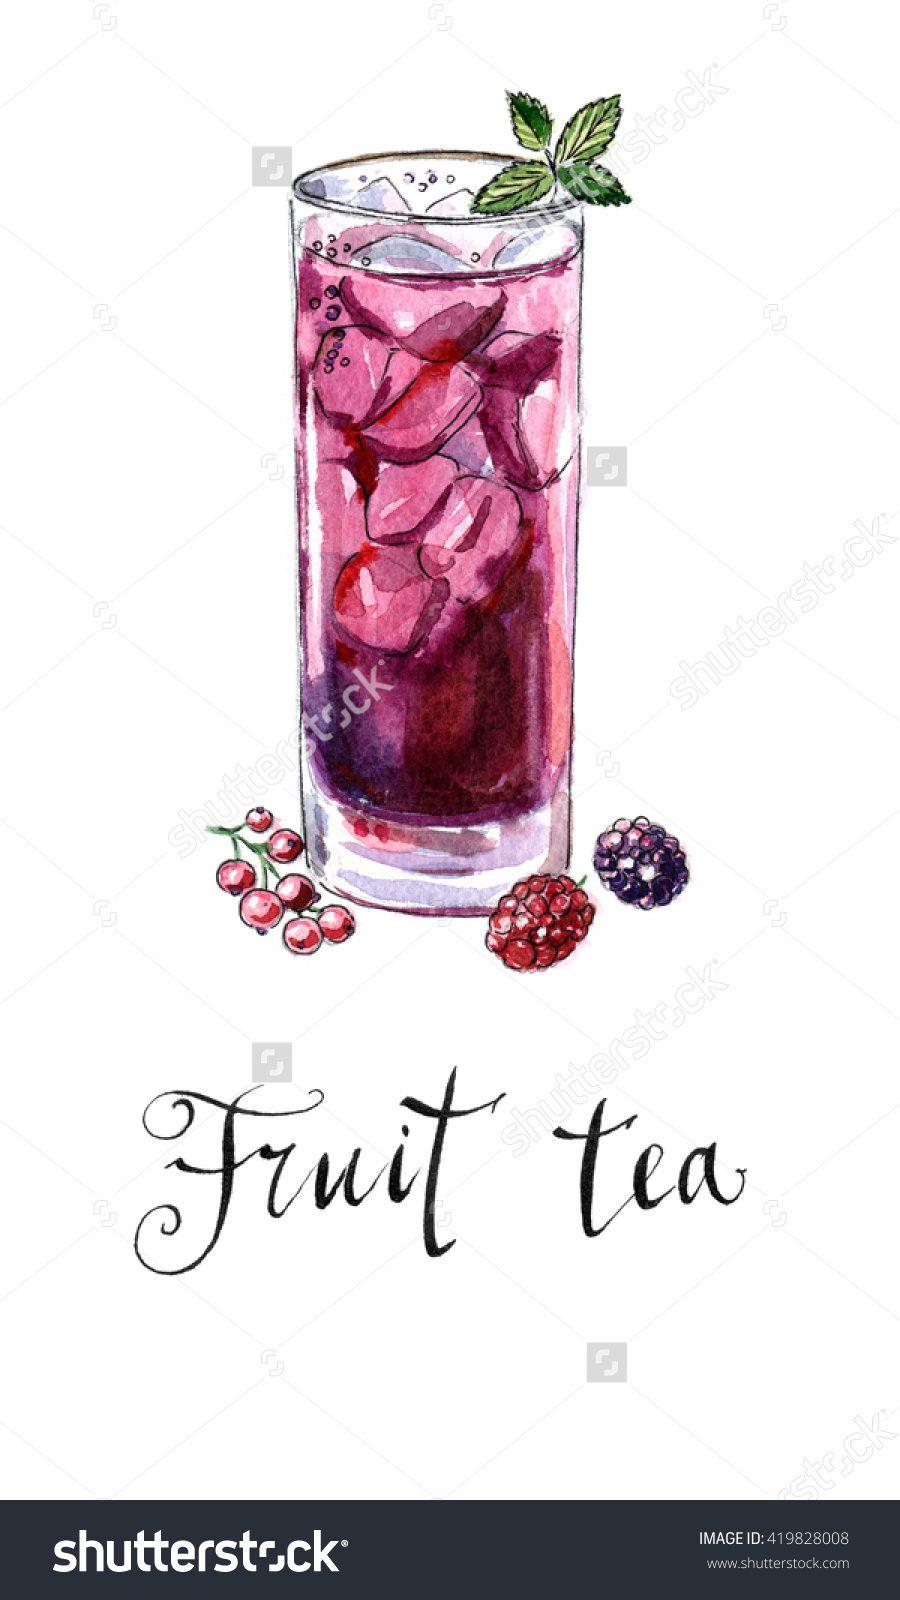 Glass of fruit tea with mint, hand drawn - watercolor Illustration-食品及饮料,物体-海洛创意(HelloRF)-Shutterstock中国独家合作伙伴-正版素材在线交易平台-站酷旗下品牌